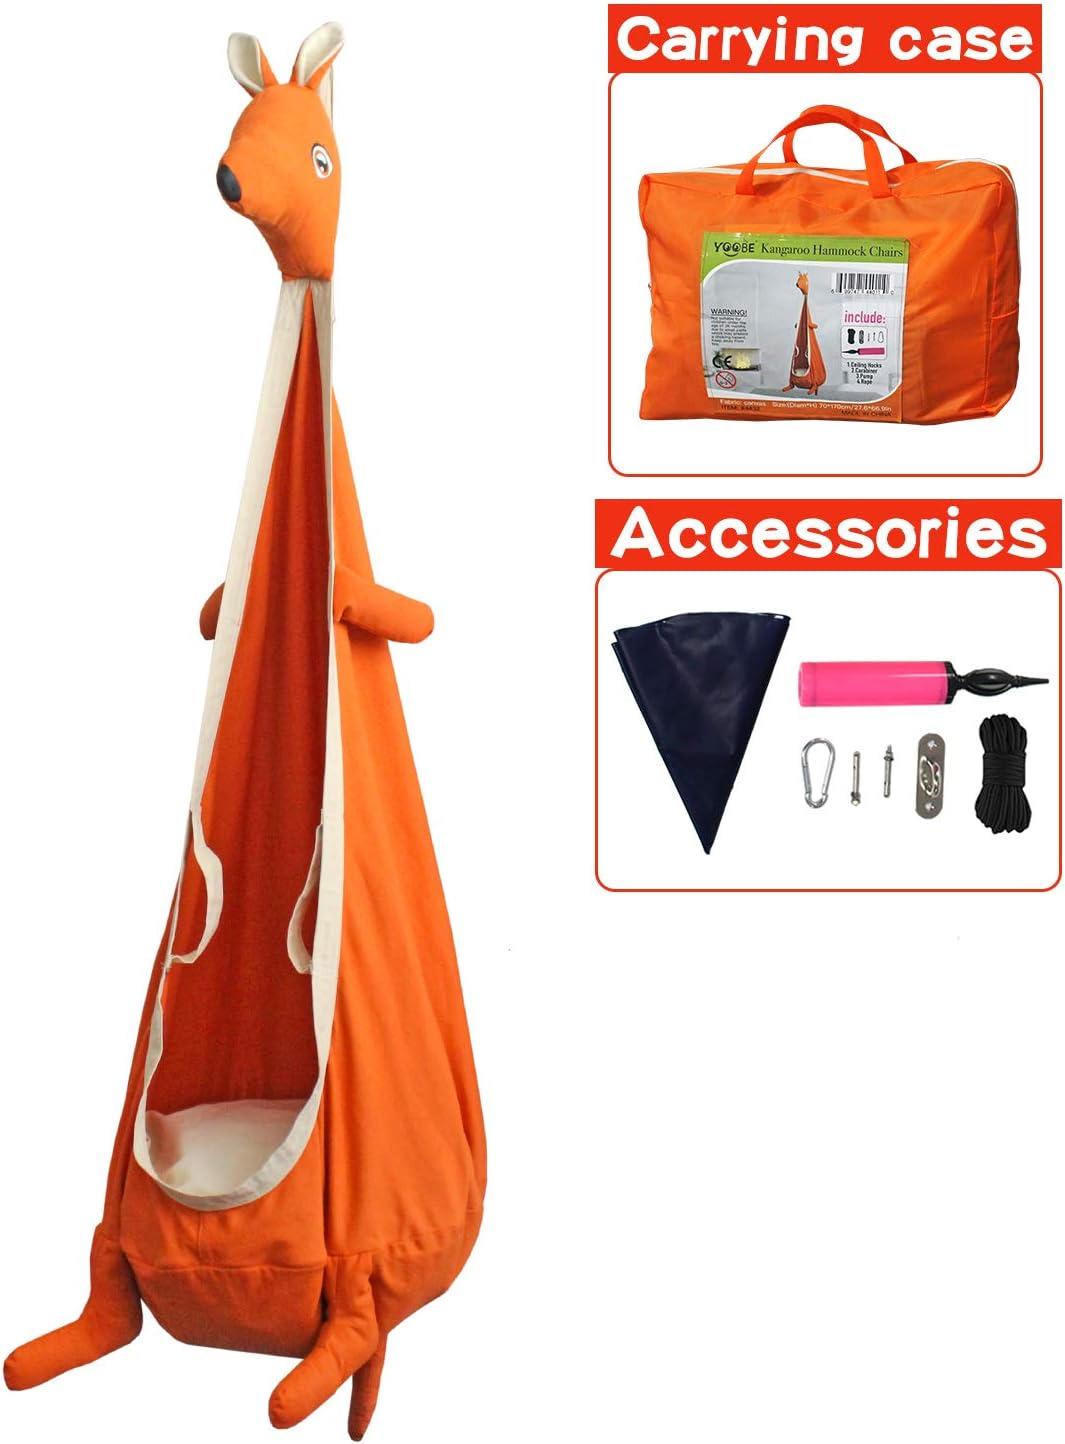 YOOBE Kangaroo Child Hammock Pod Swing Chair Nook Animal Tent - Kids Outdoor Indoor Swing Cloth Hanging Seat - Include Hardware Kit